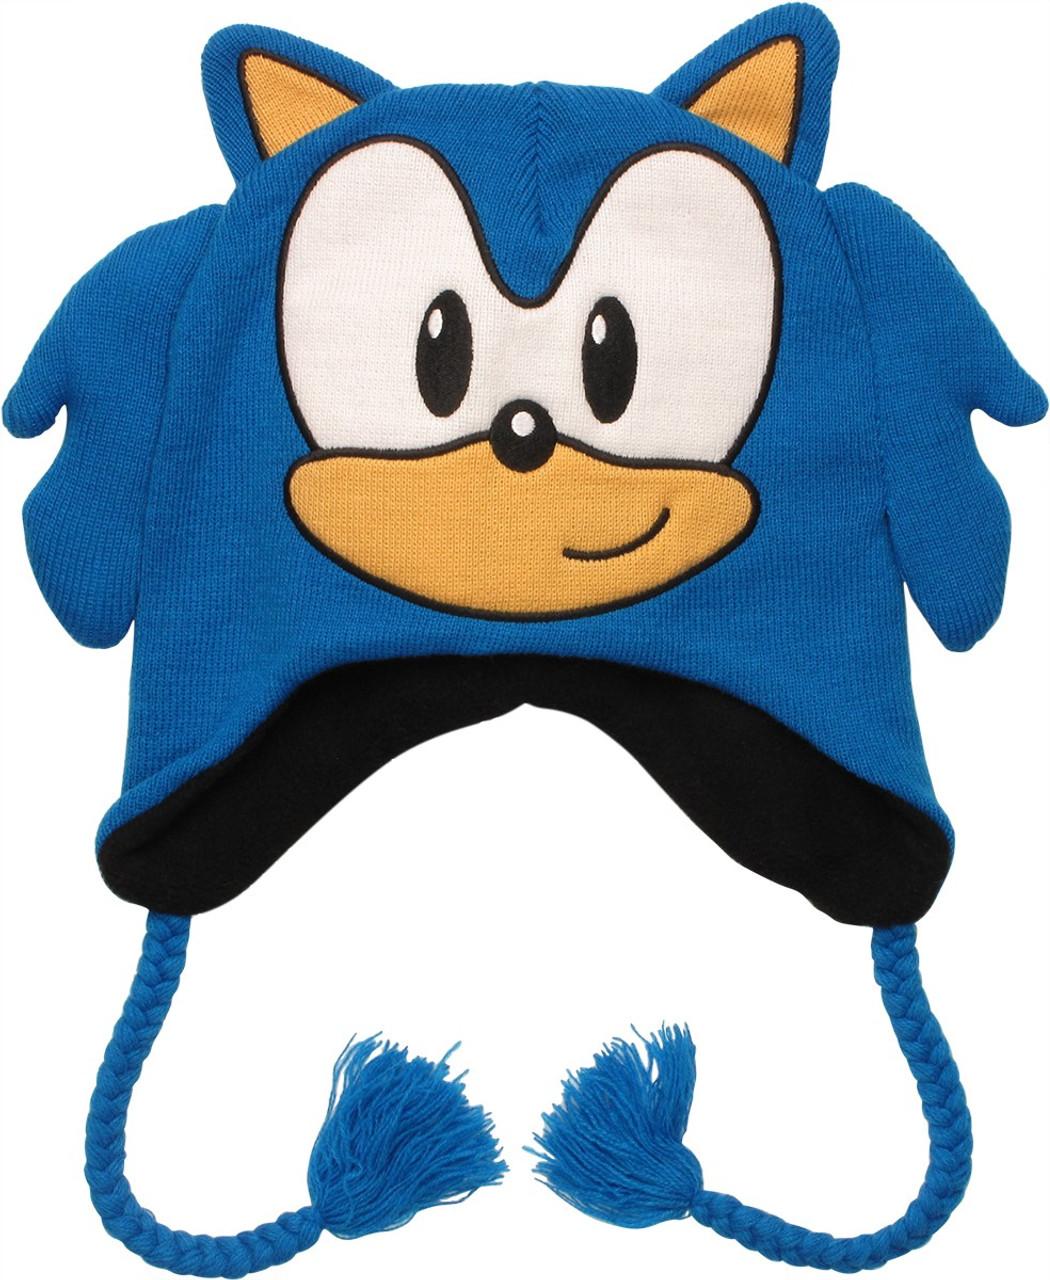 Sonic The Hedgehog Face Lapland Beanie